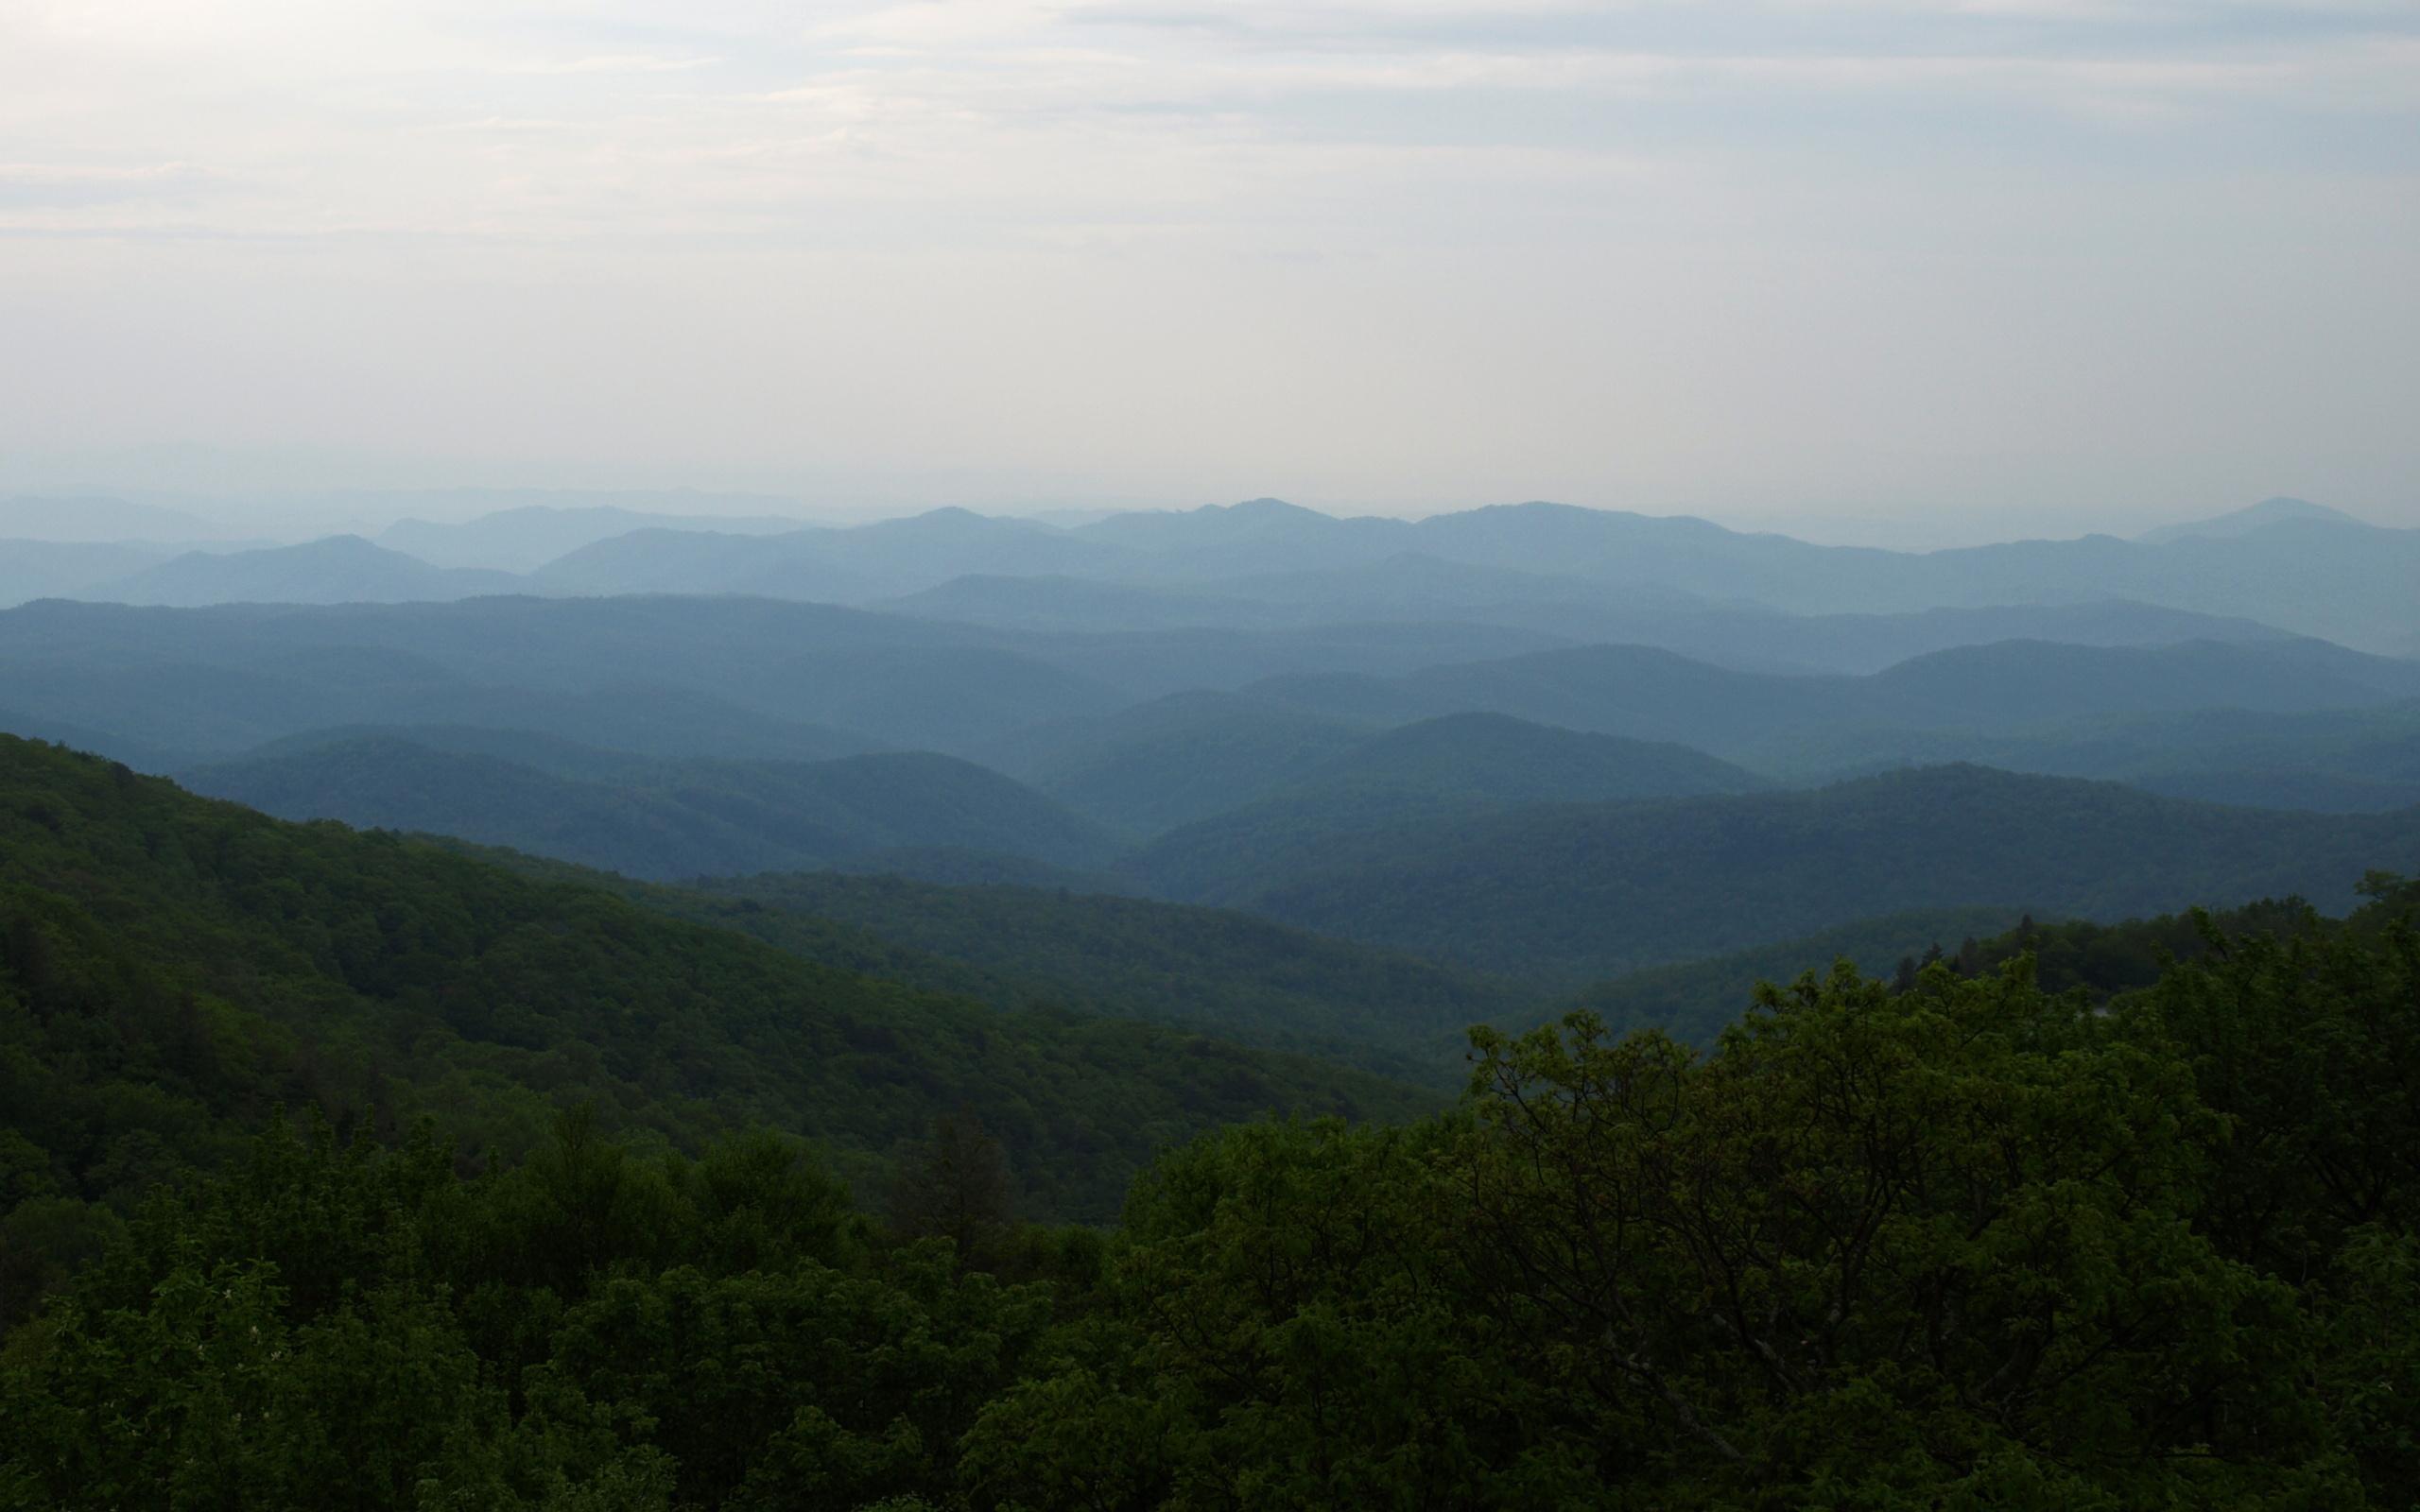 File:Blue Ridge Mountains-27527-1.jpg - Wikimedia Commons